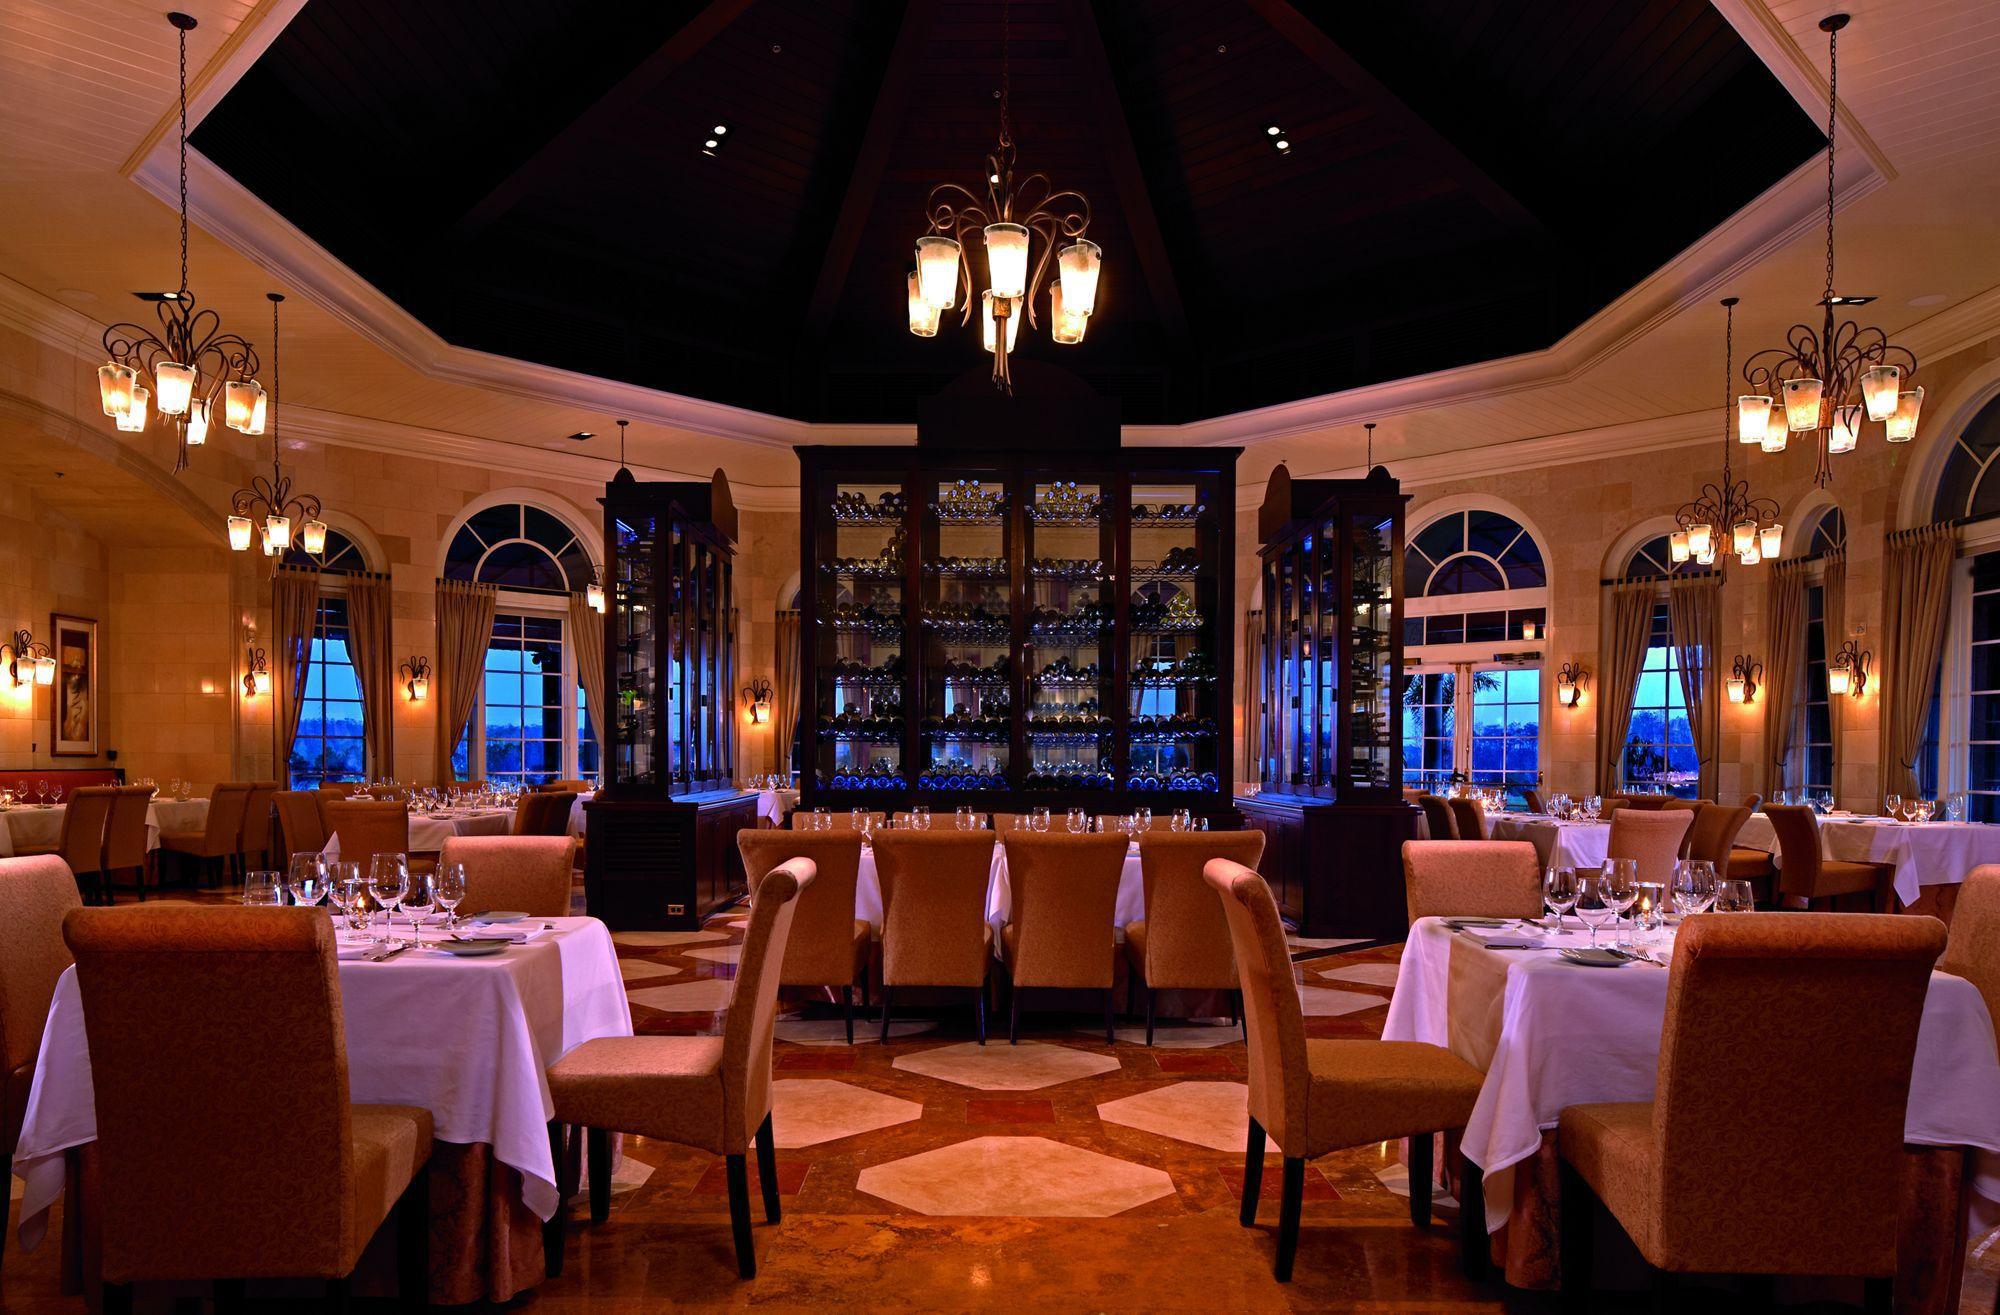 Top Romantic Restaurants In Orlando